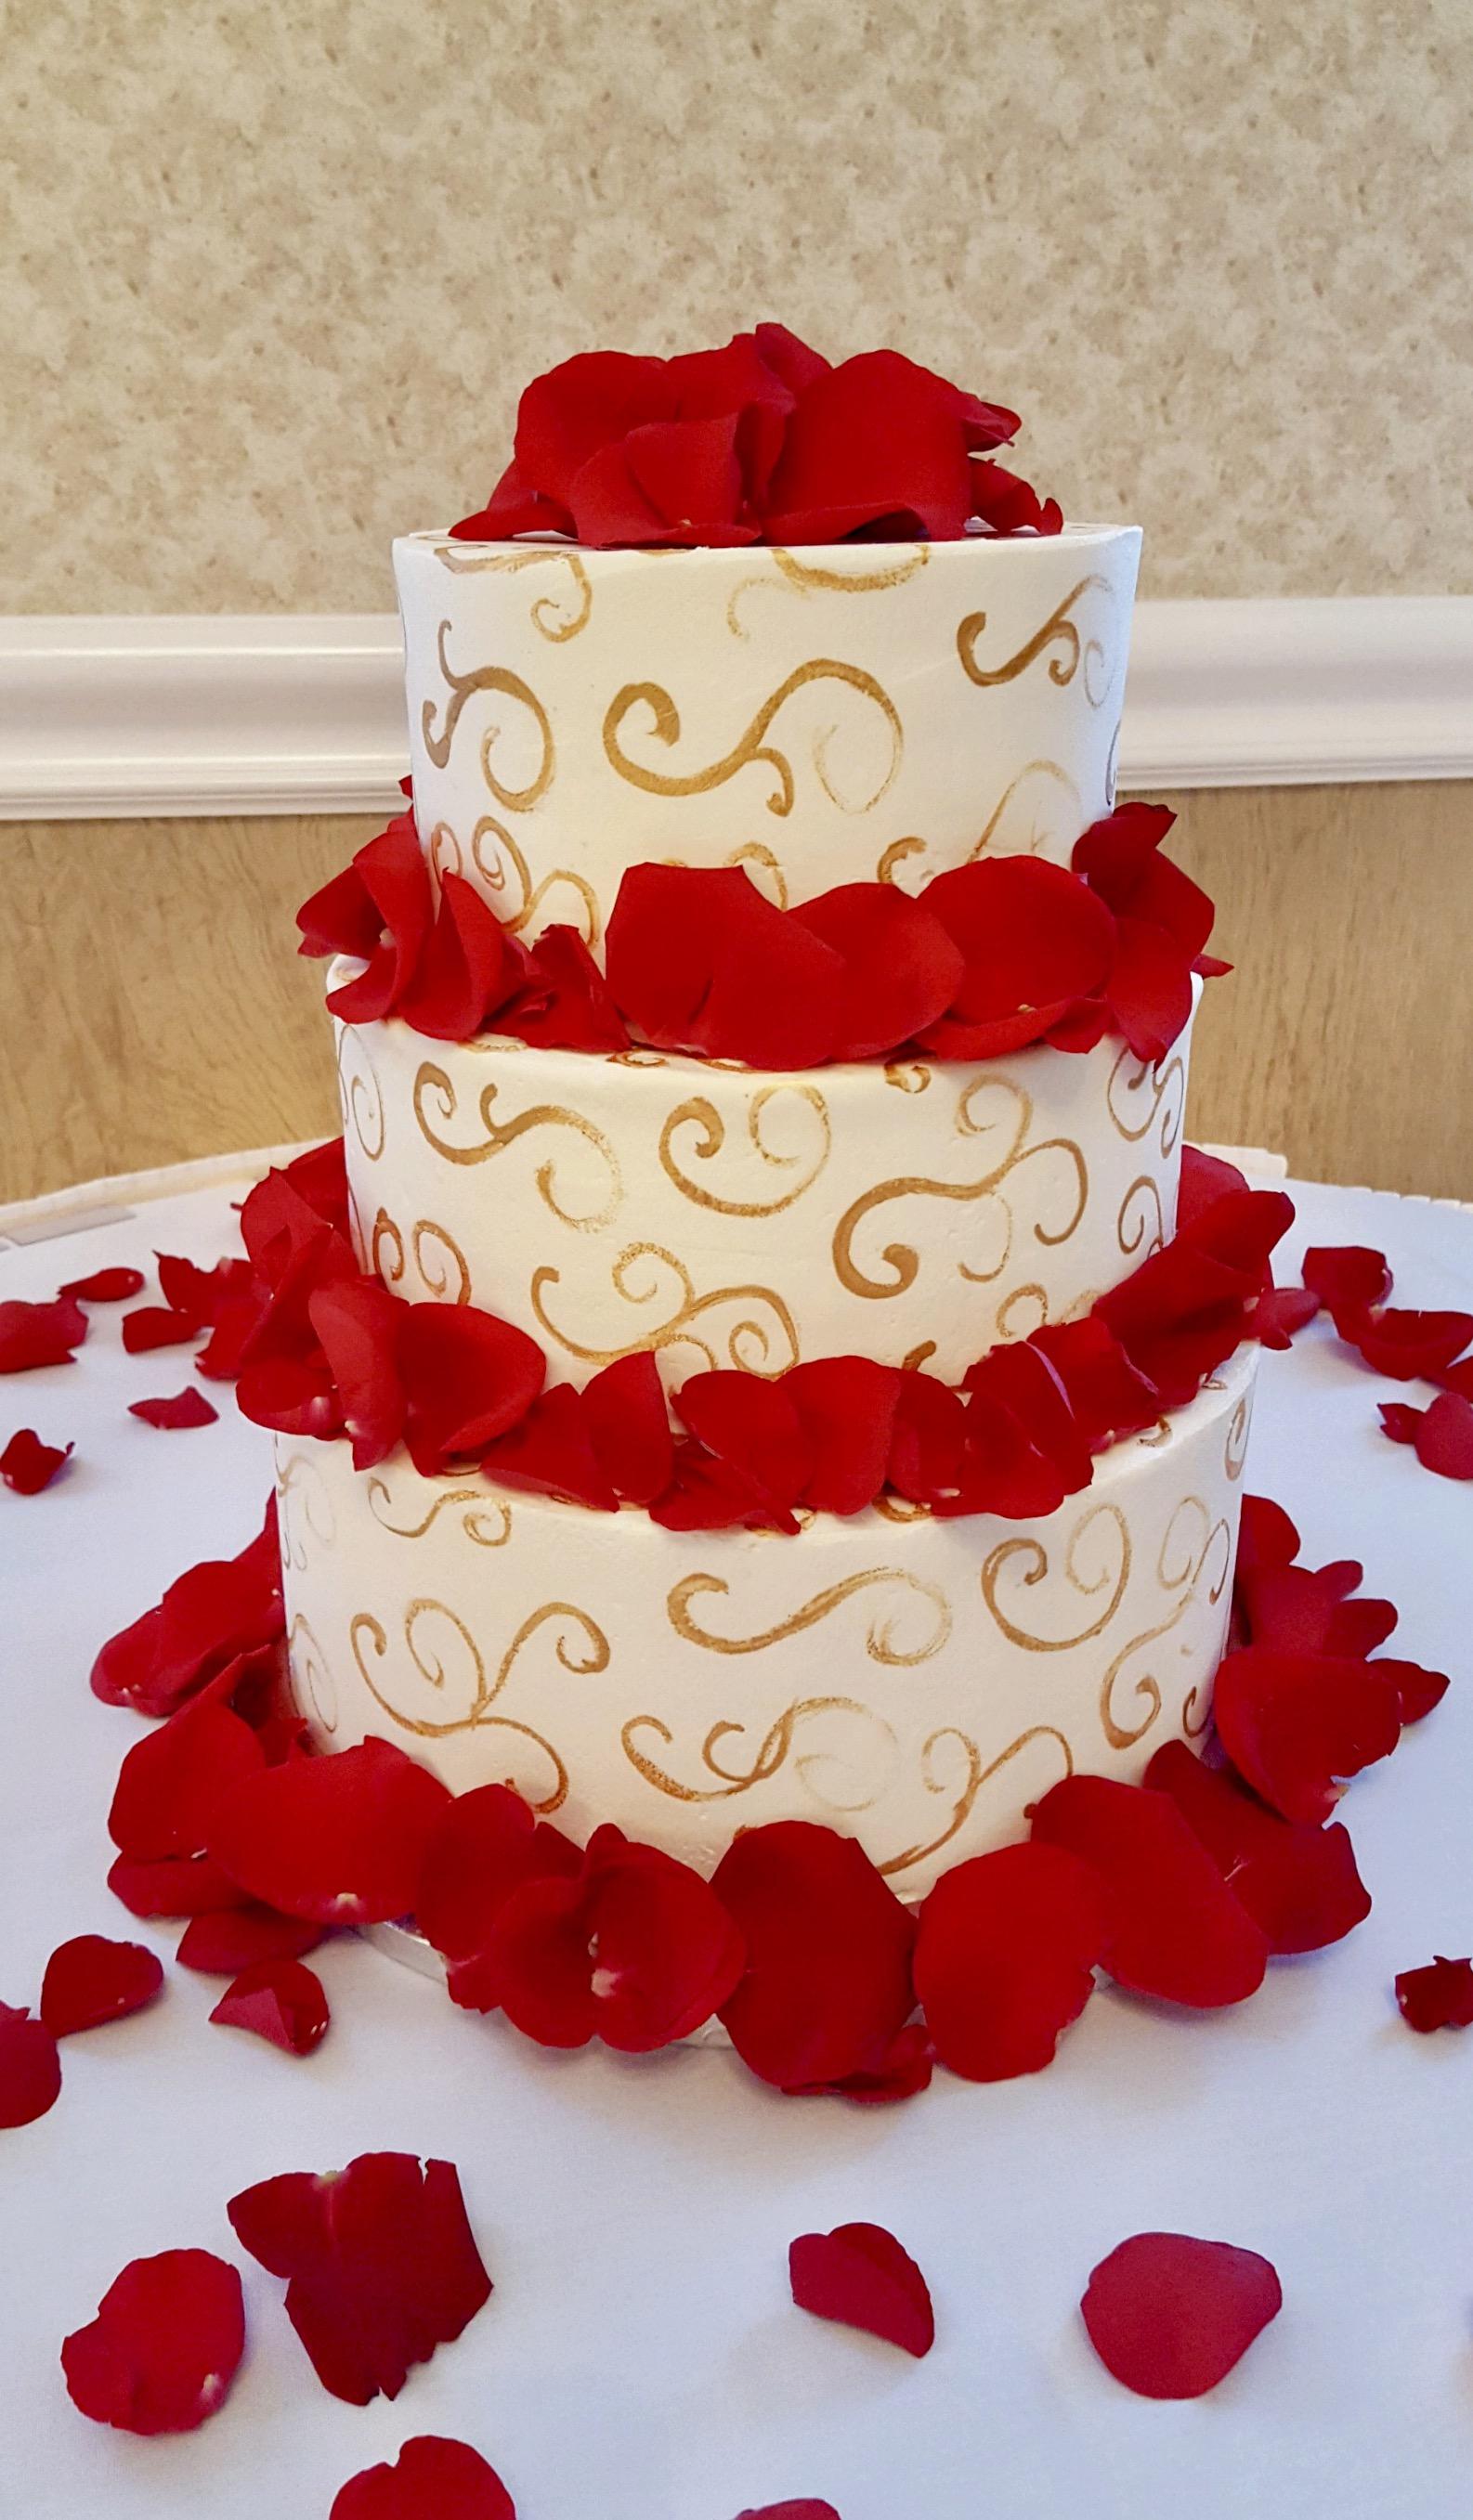 Wedding3tierredandgold.jpg